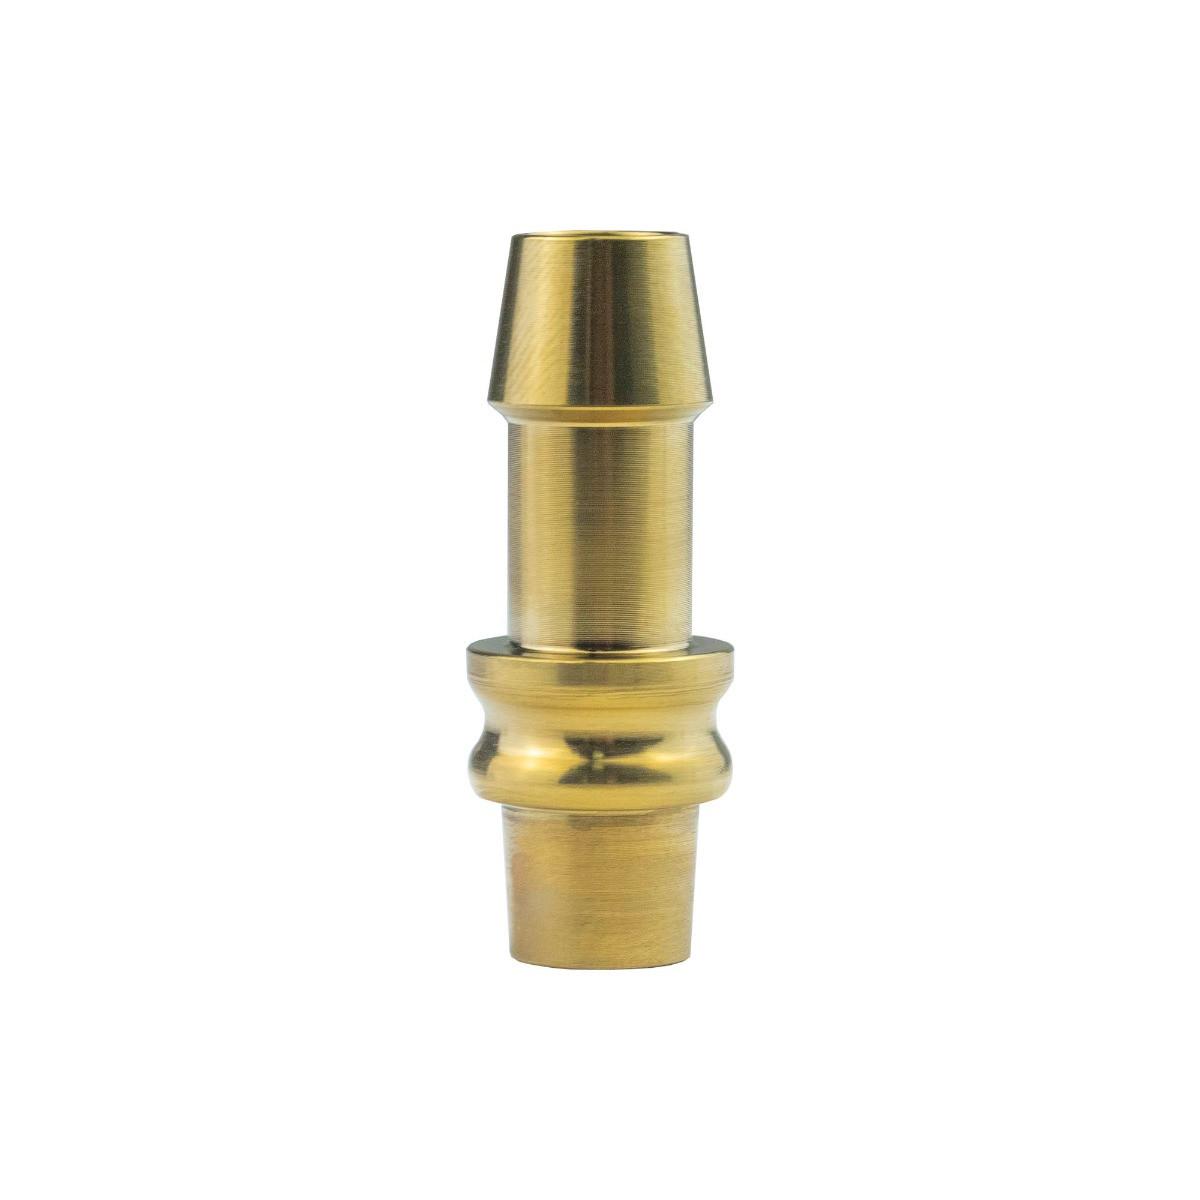 Hoob Plug Futurist Gold | Magnetic hose connector